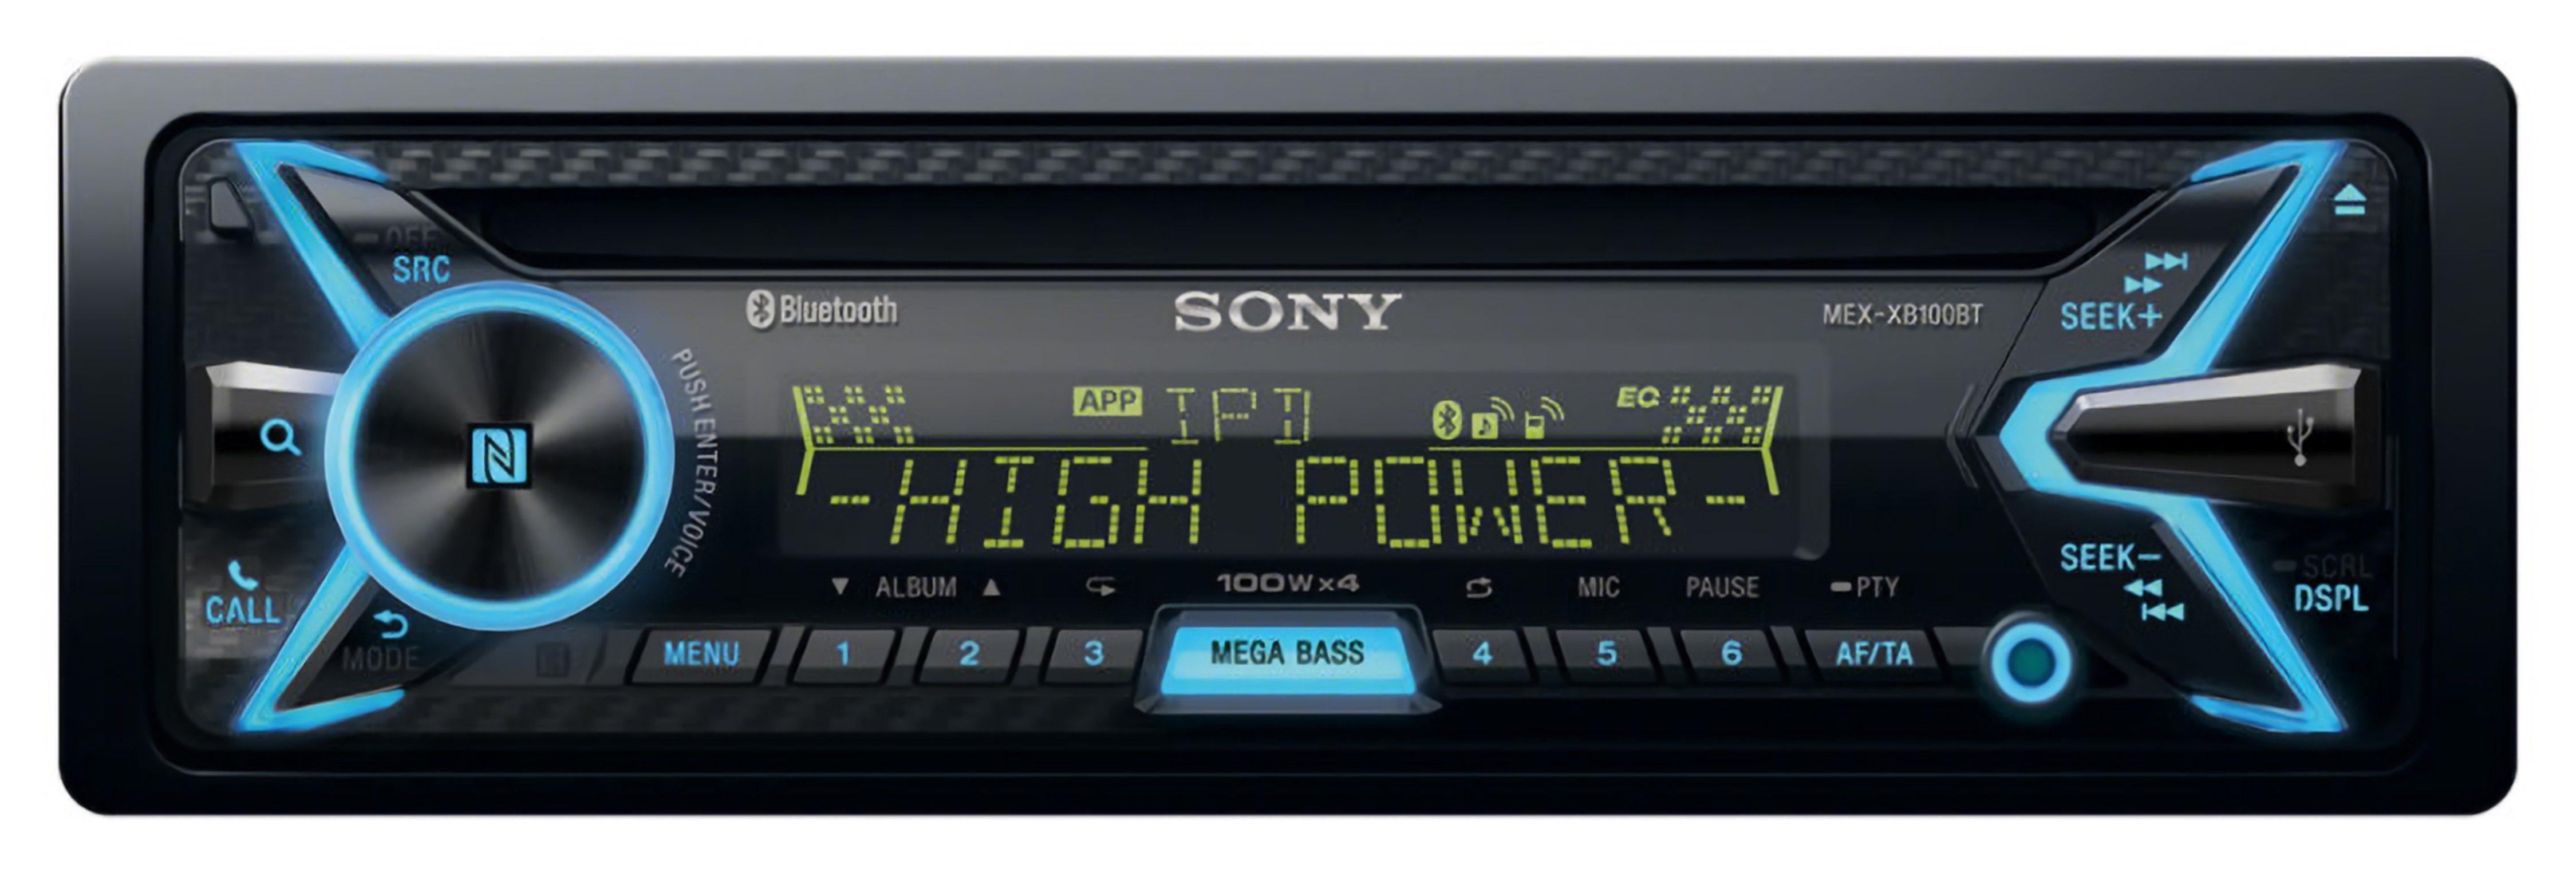 Sony 1-DIN CD-Receiver mit Bluetooth »MEX-XB100BT«